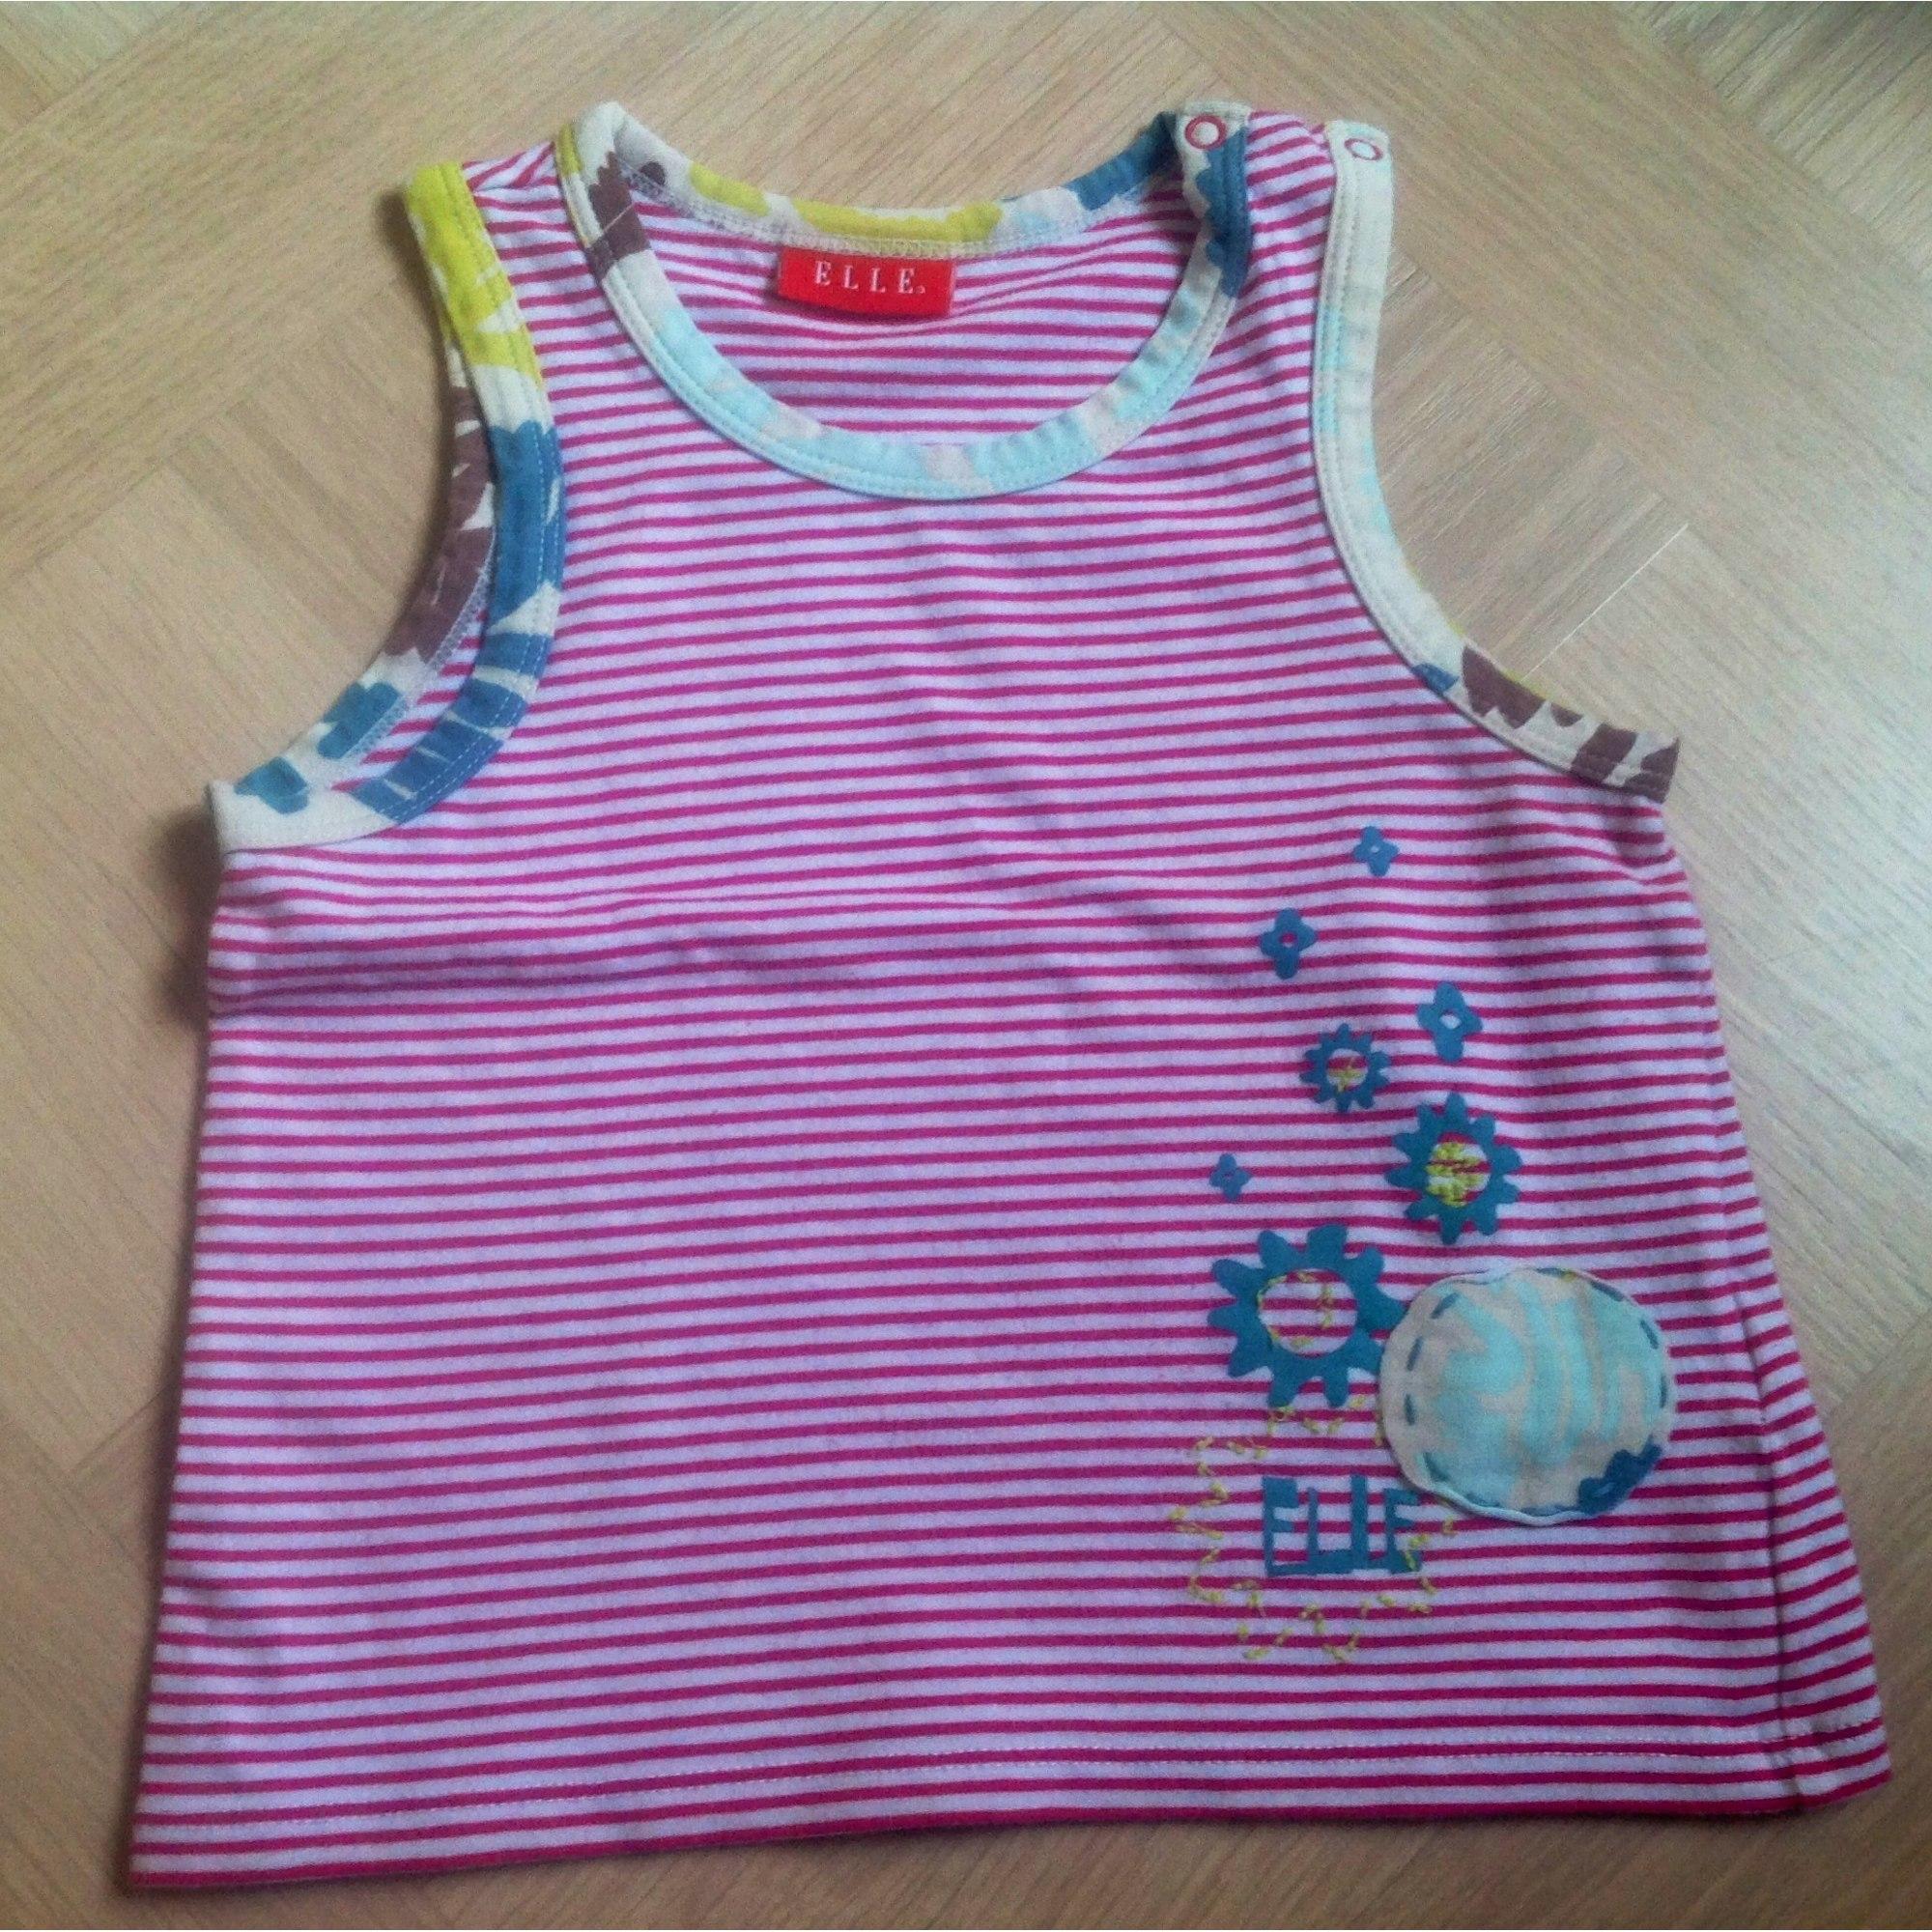 Top, Tee-shirt ELLE Multicouleur